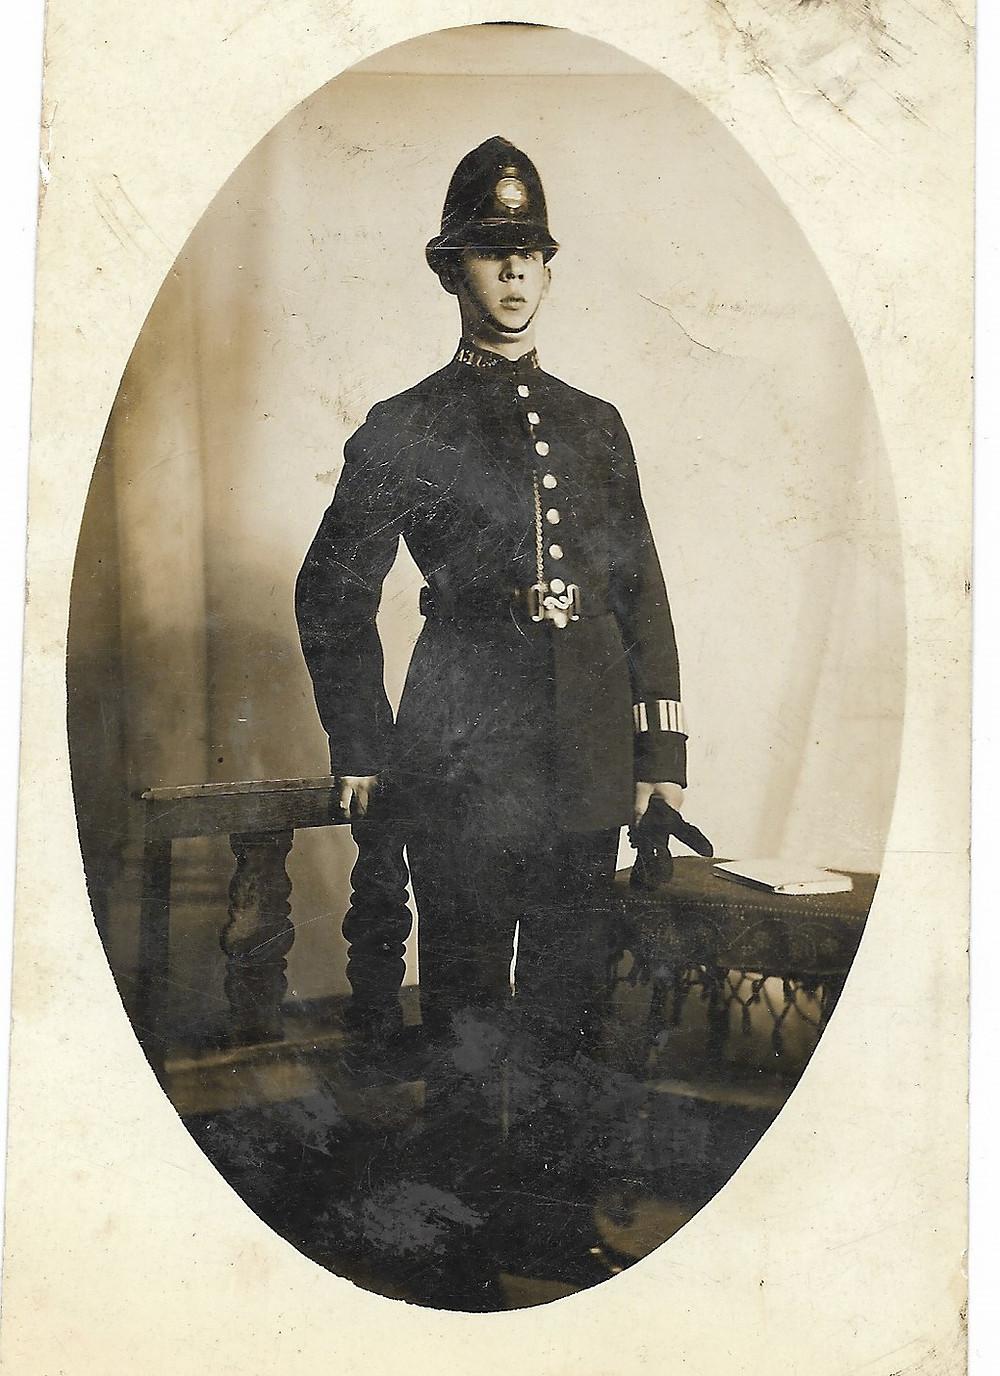 Tom Clark in his police uniform.